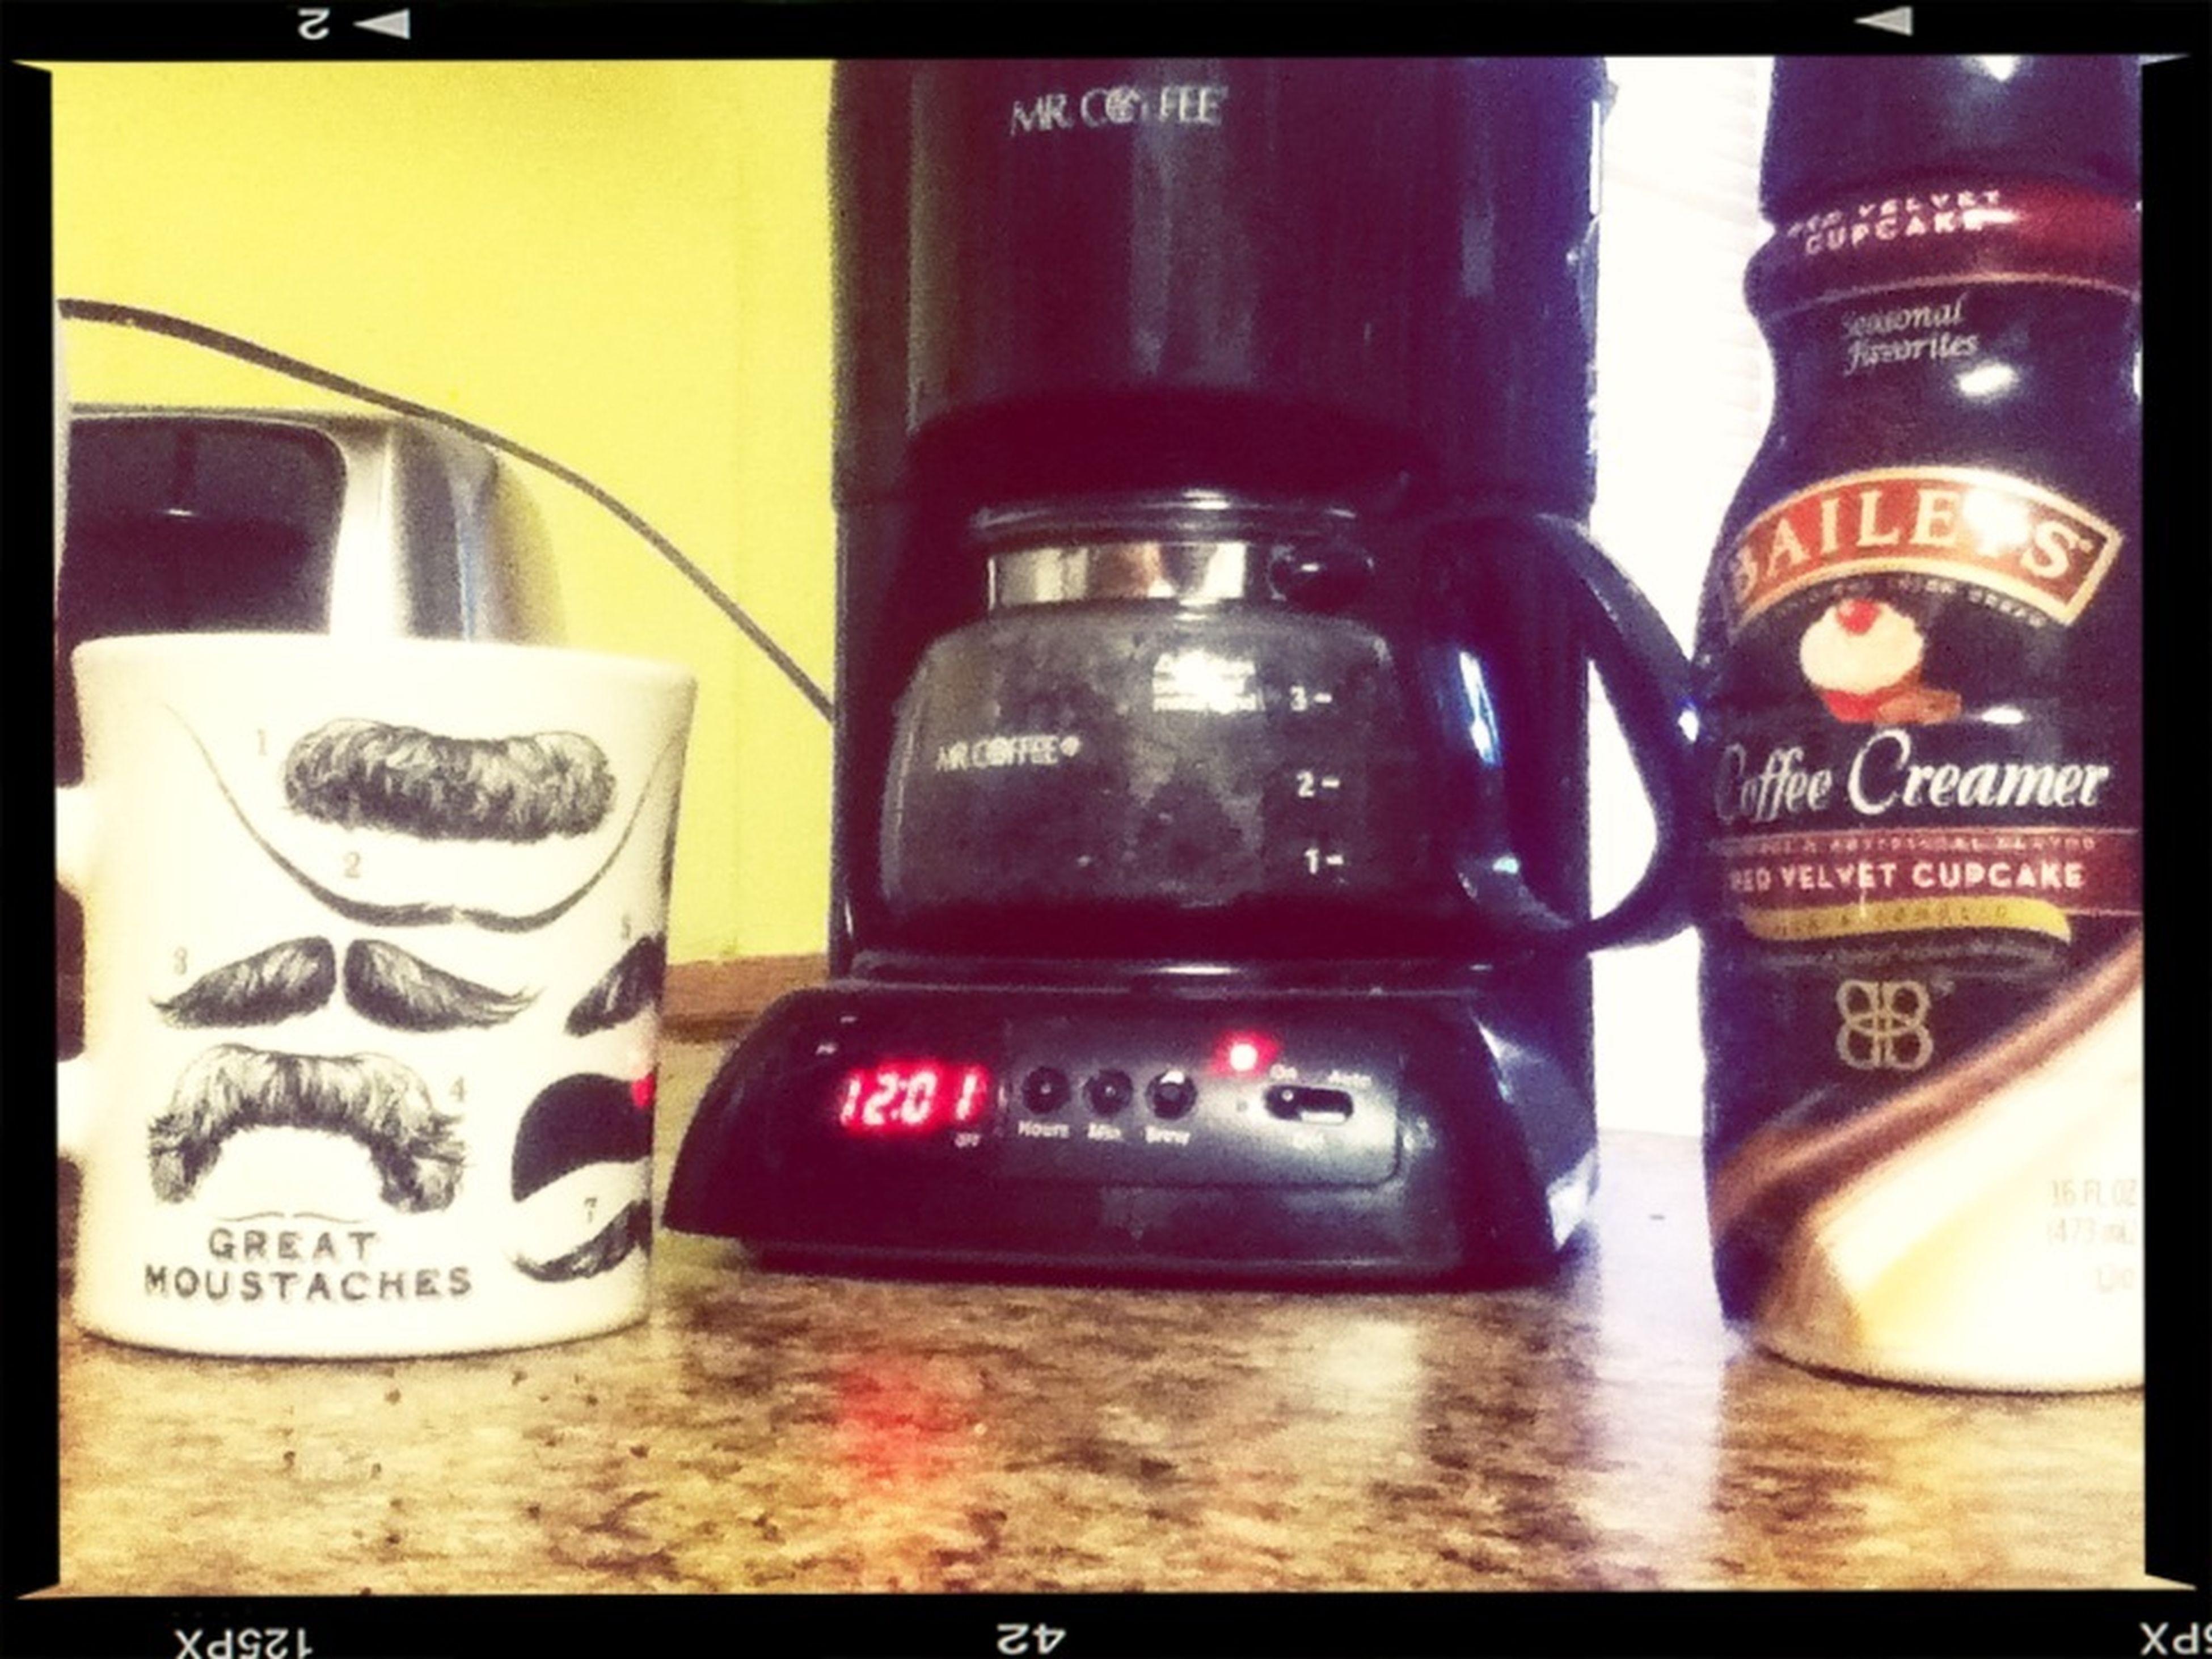 Perfect breakfast. Stay safe Louisiana! Coffee